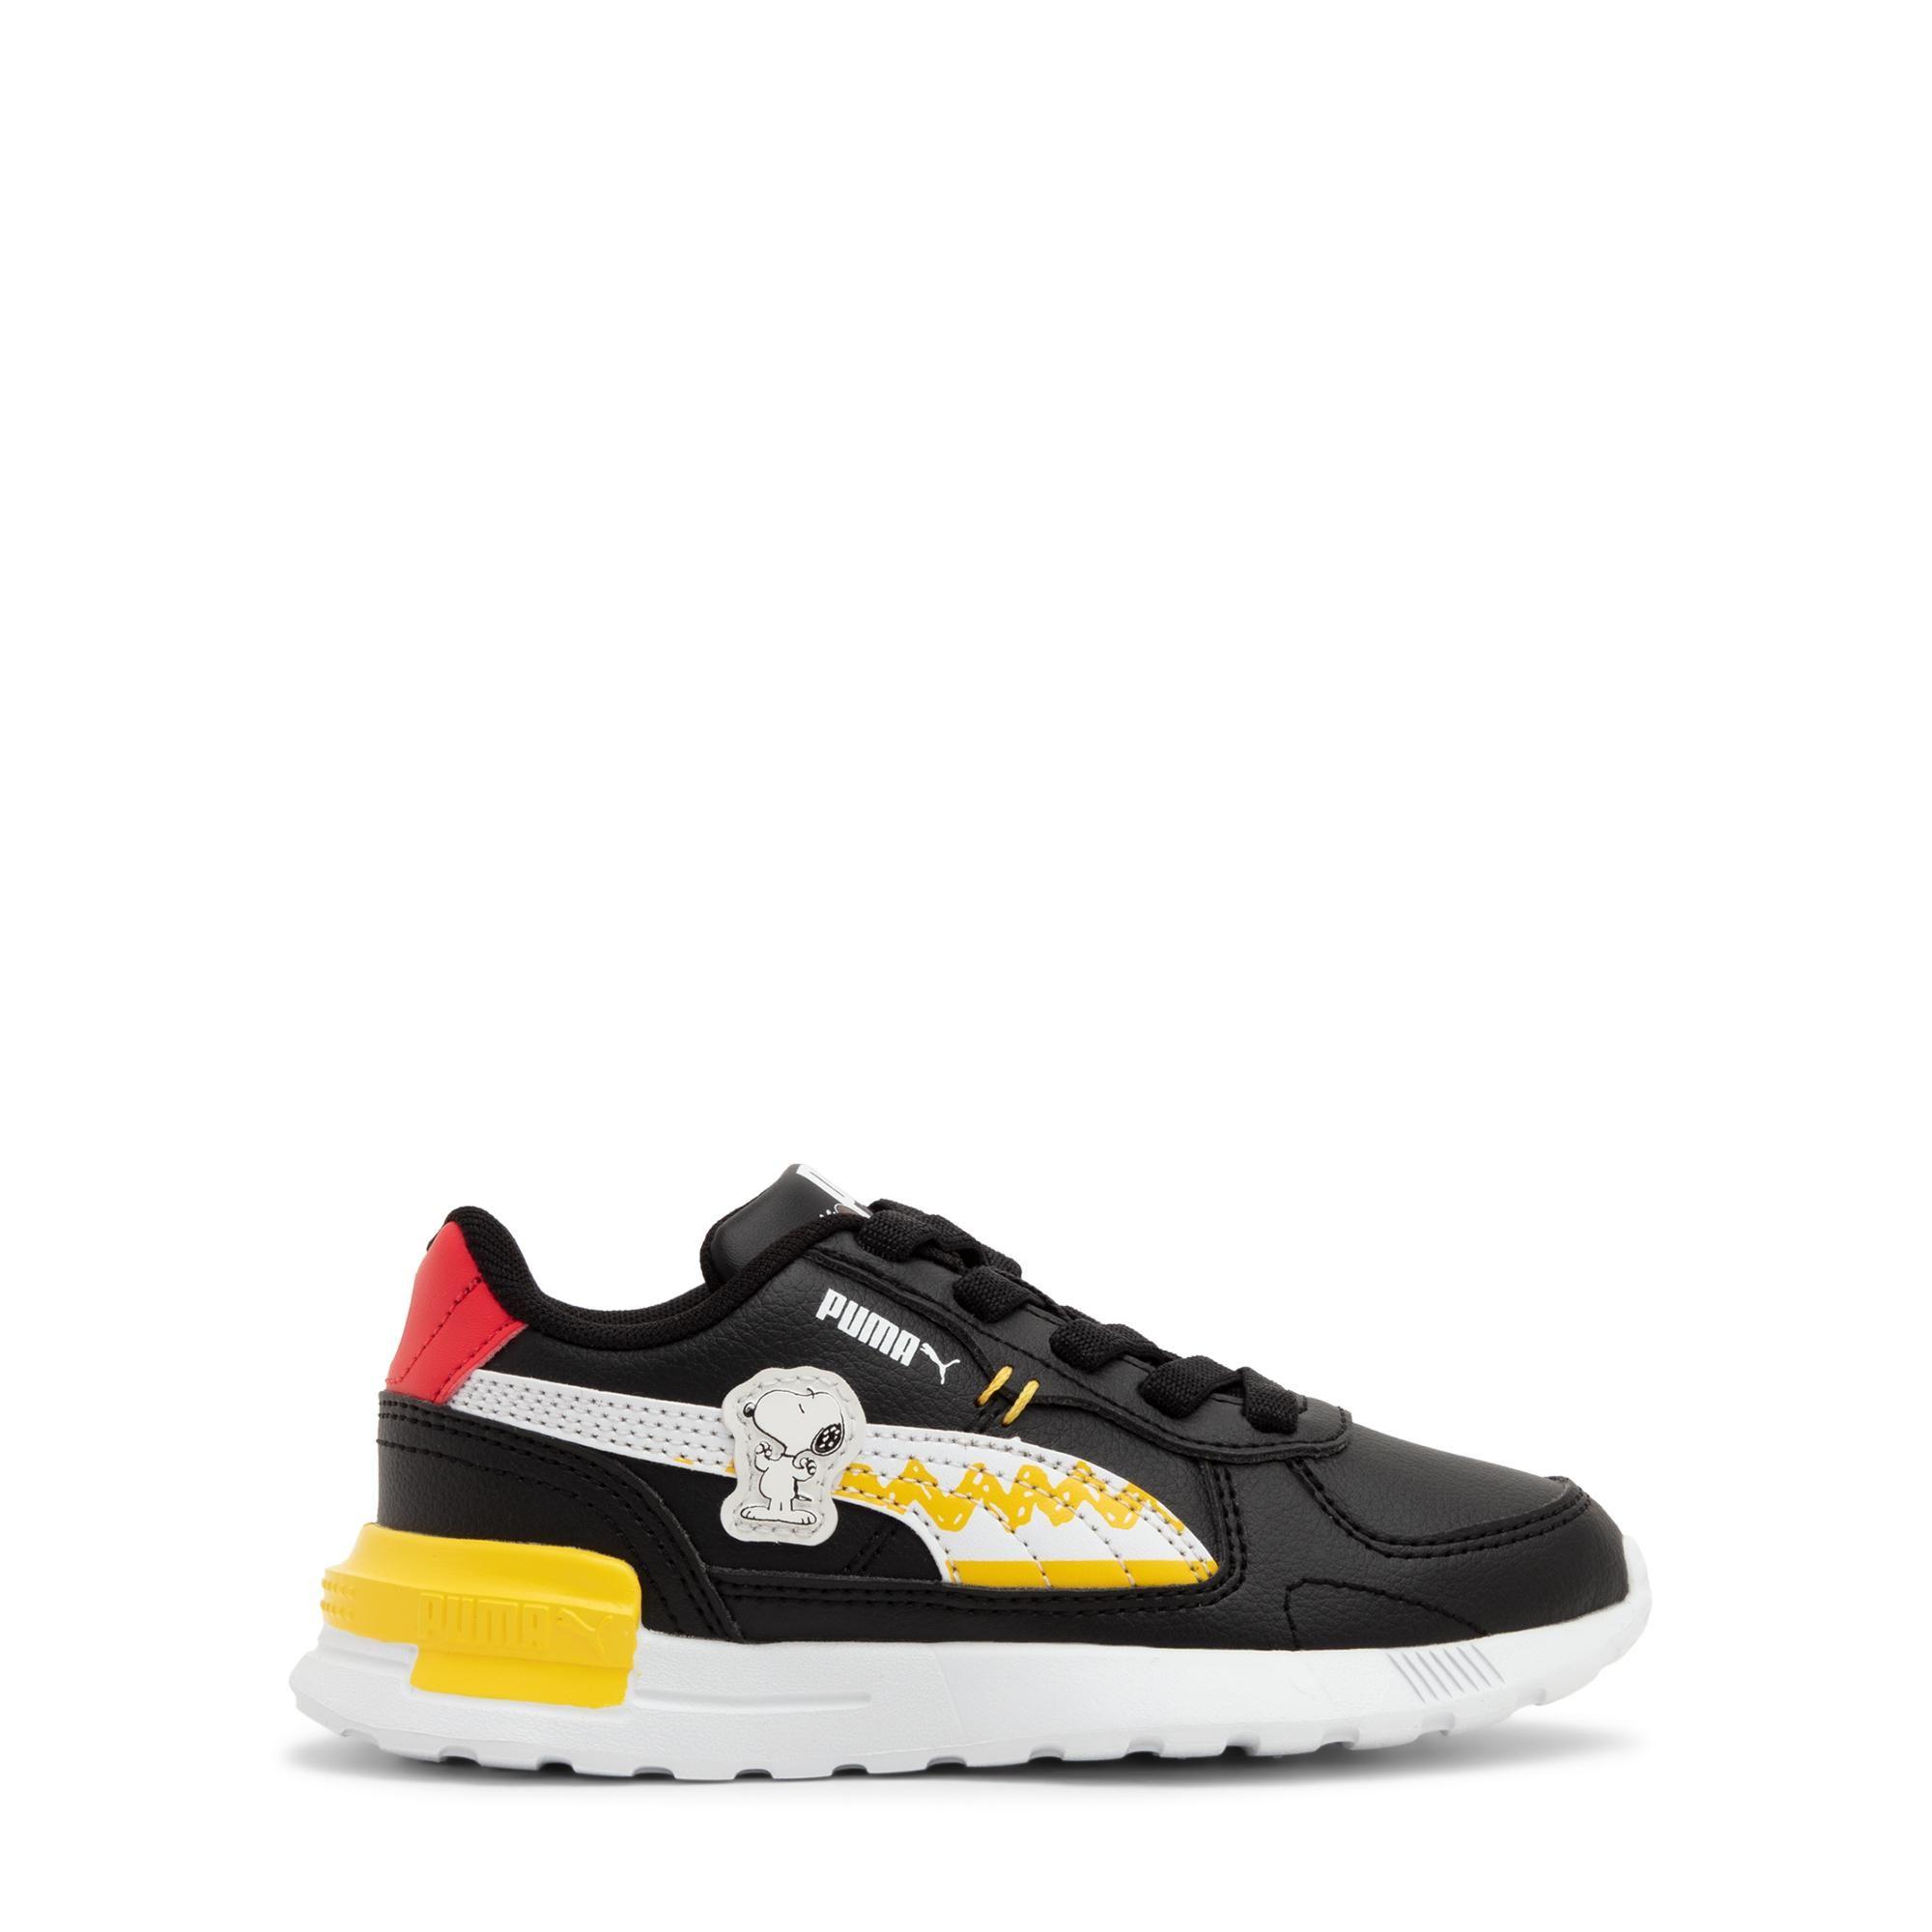 PEANUTS Graviton sneakers